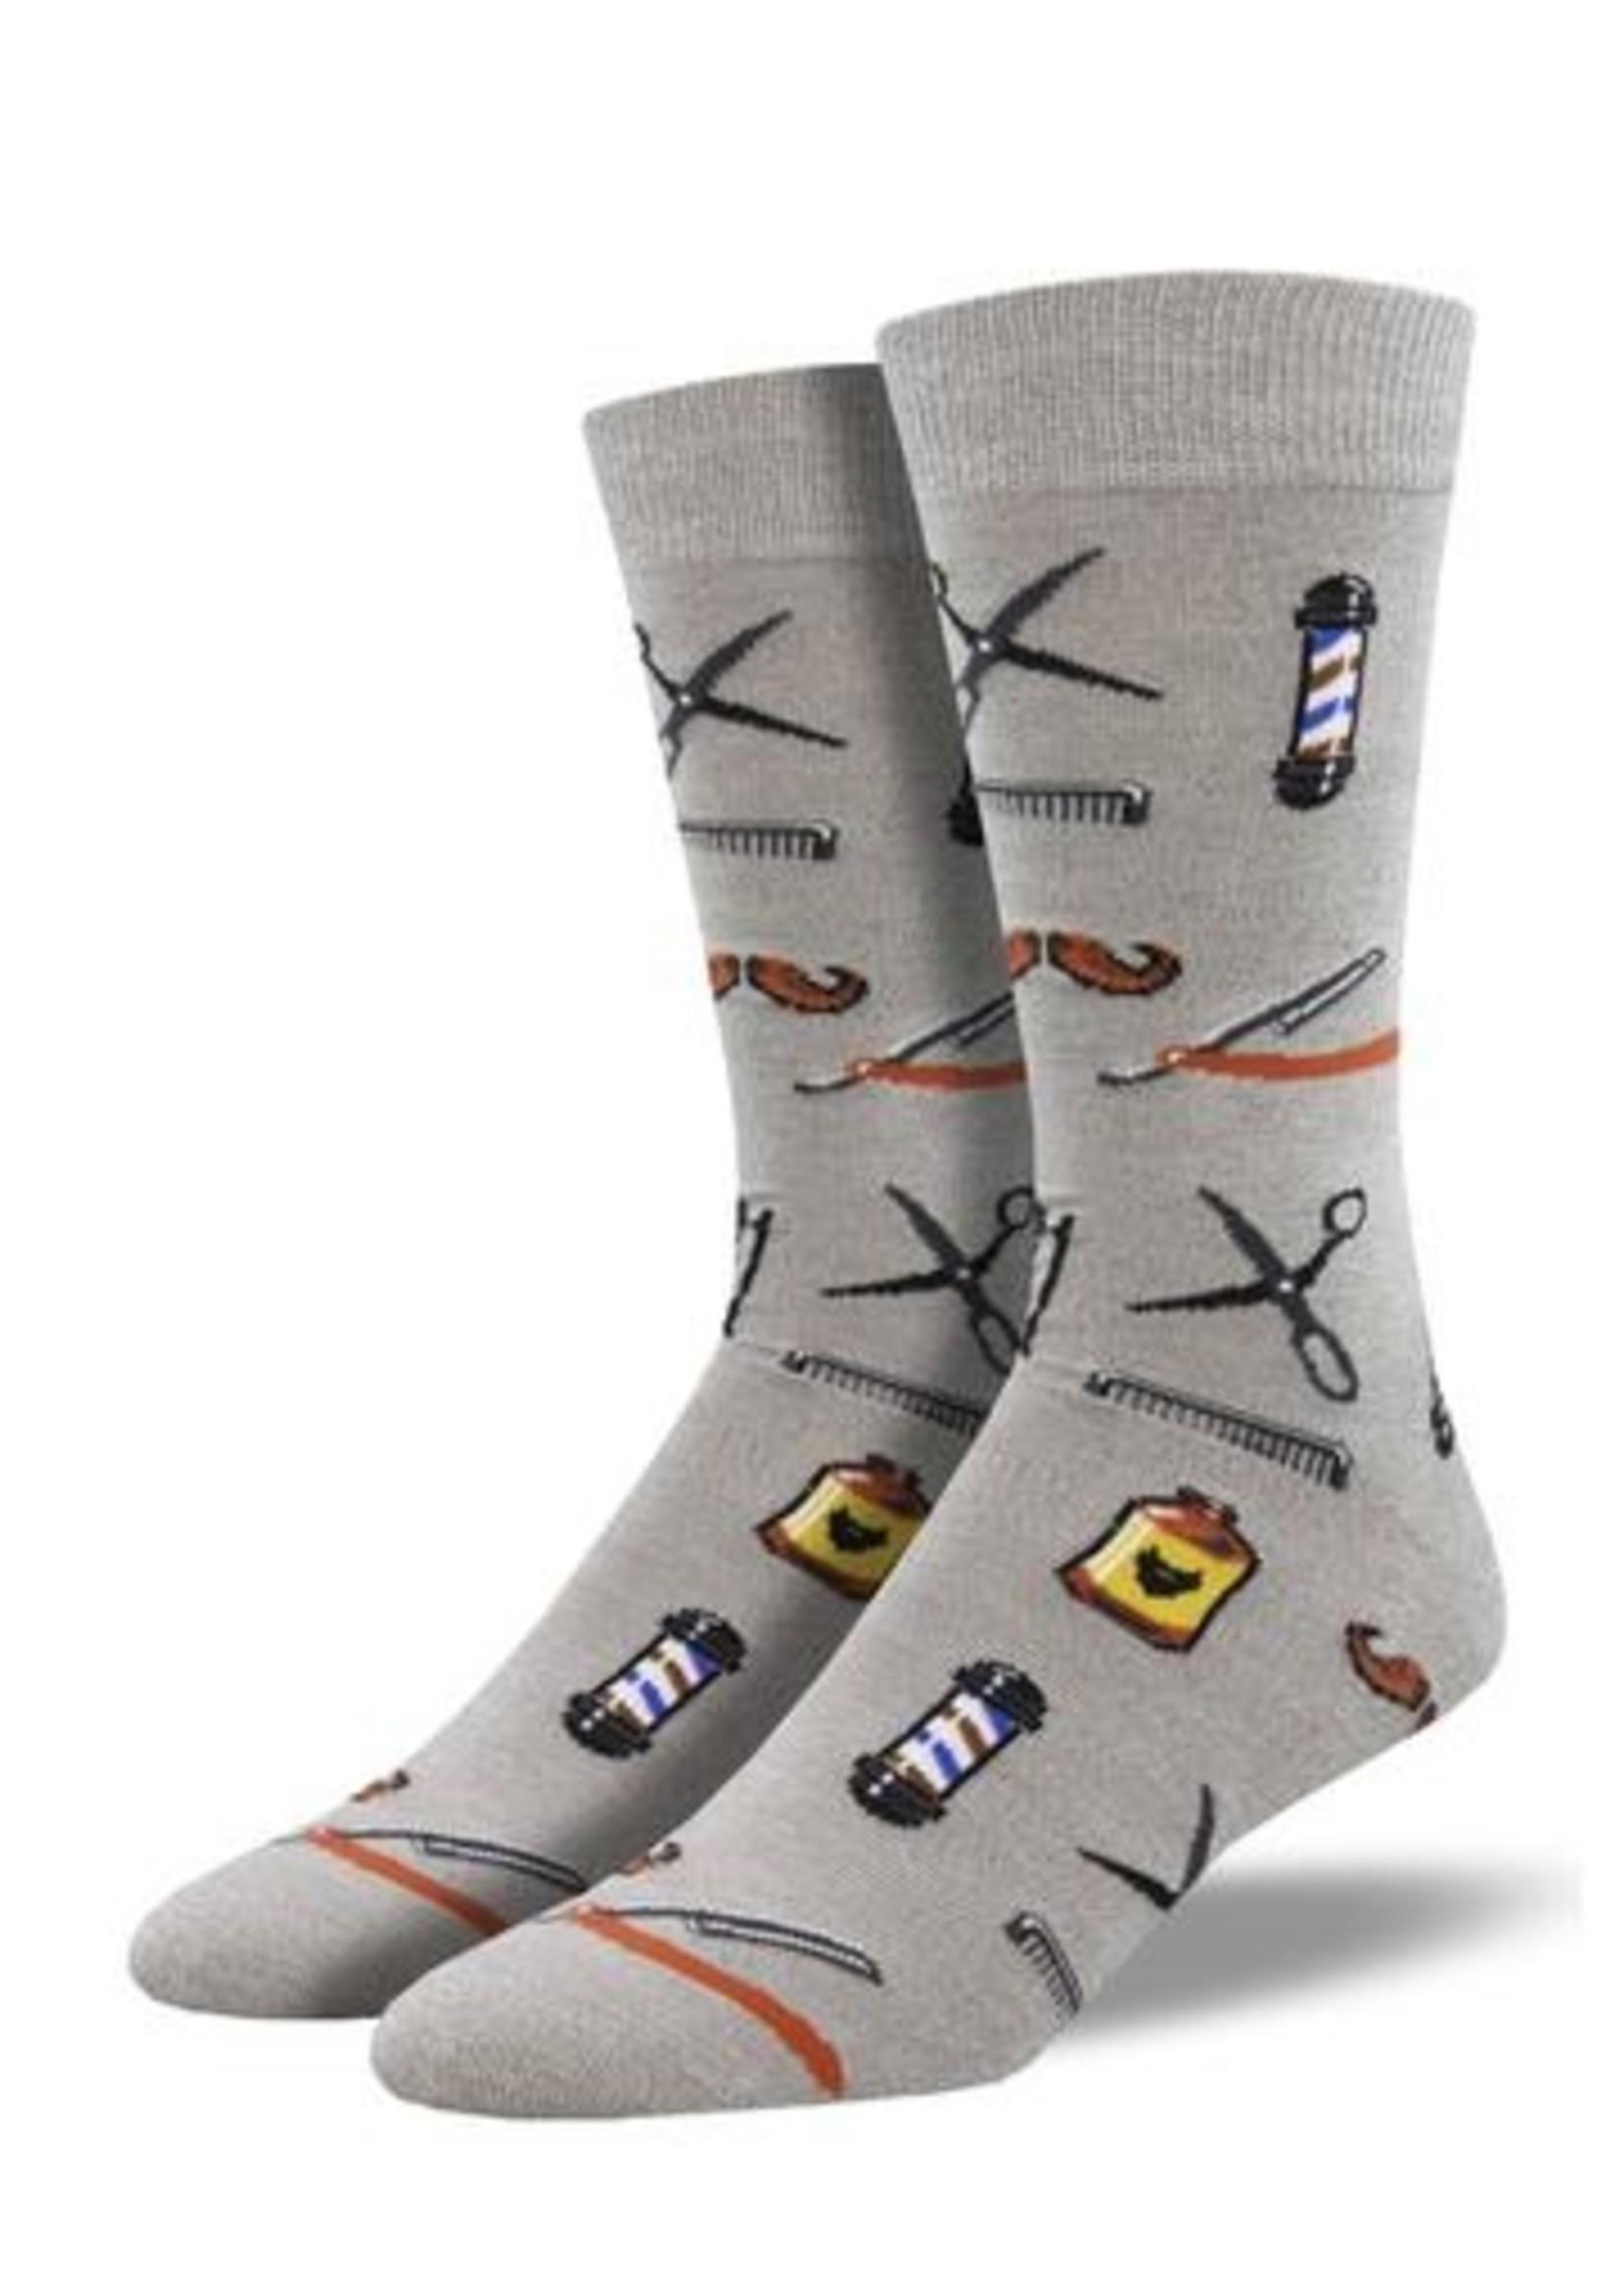 Socksmith Canada Bamboo Barber Shop Socks